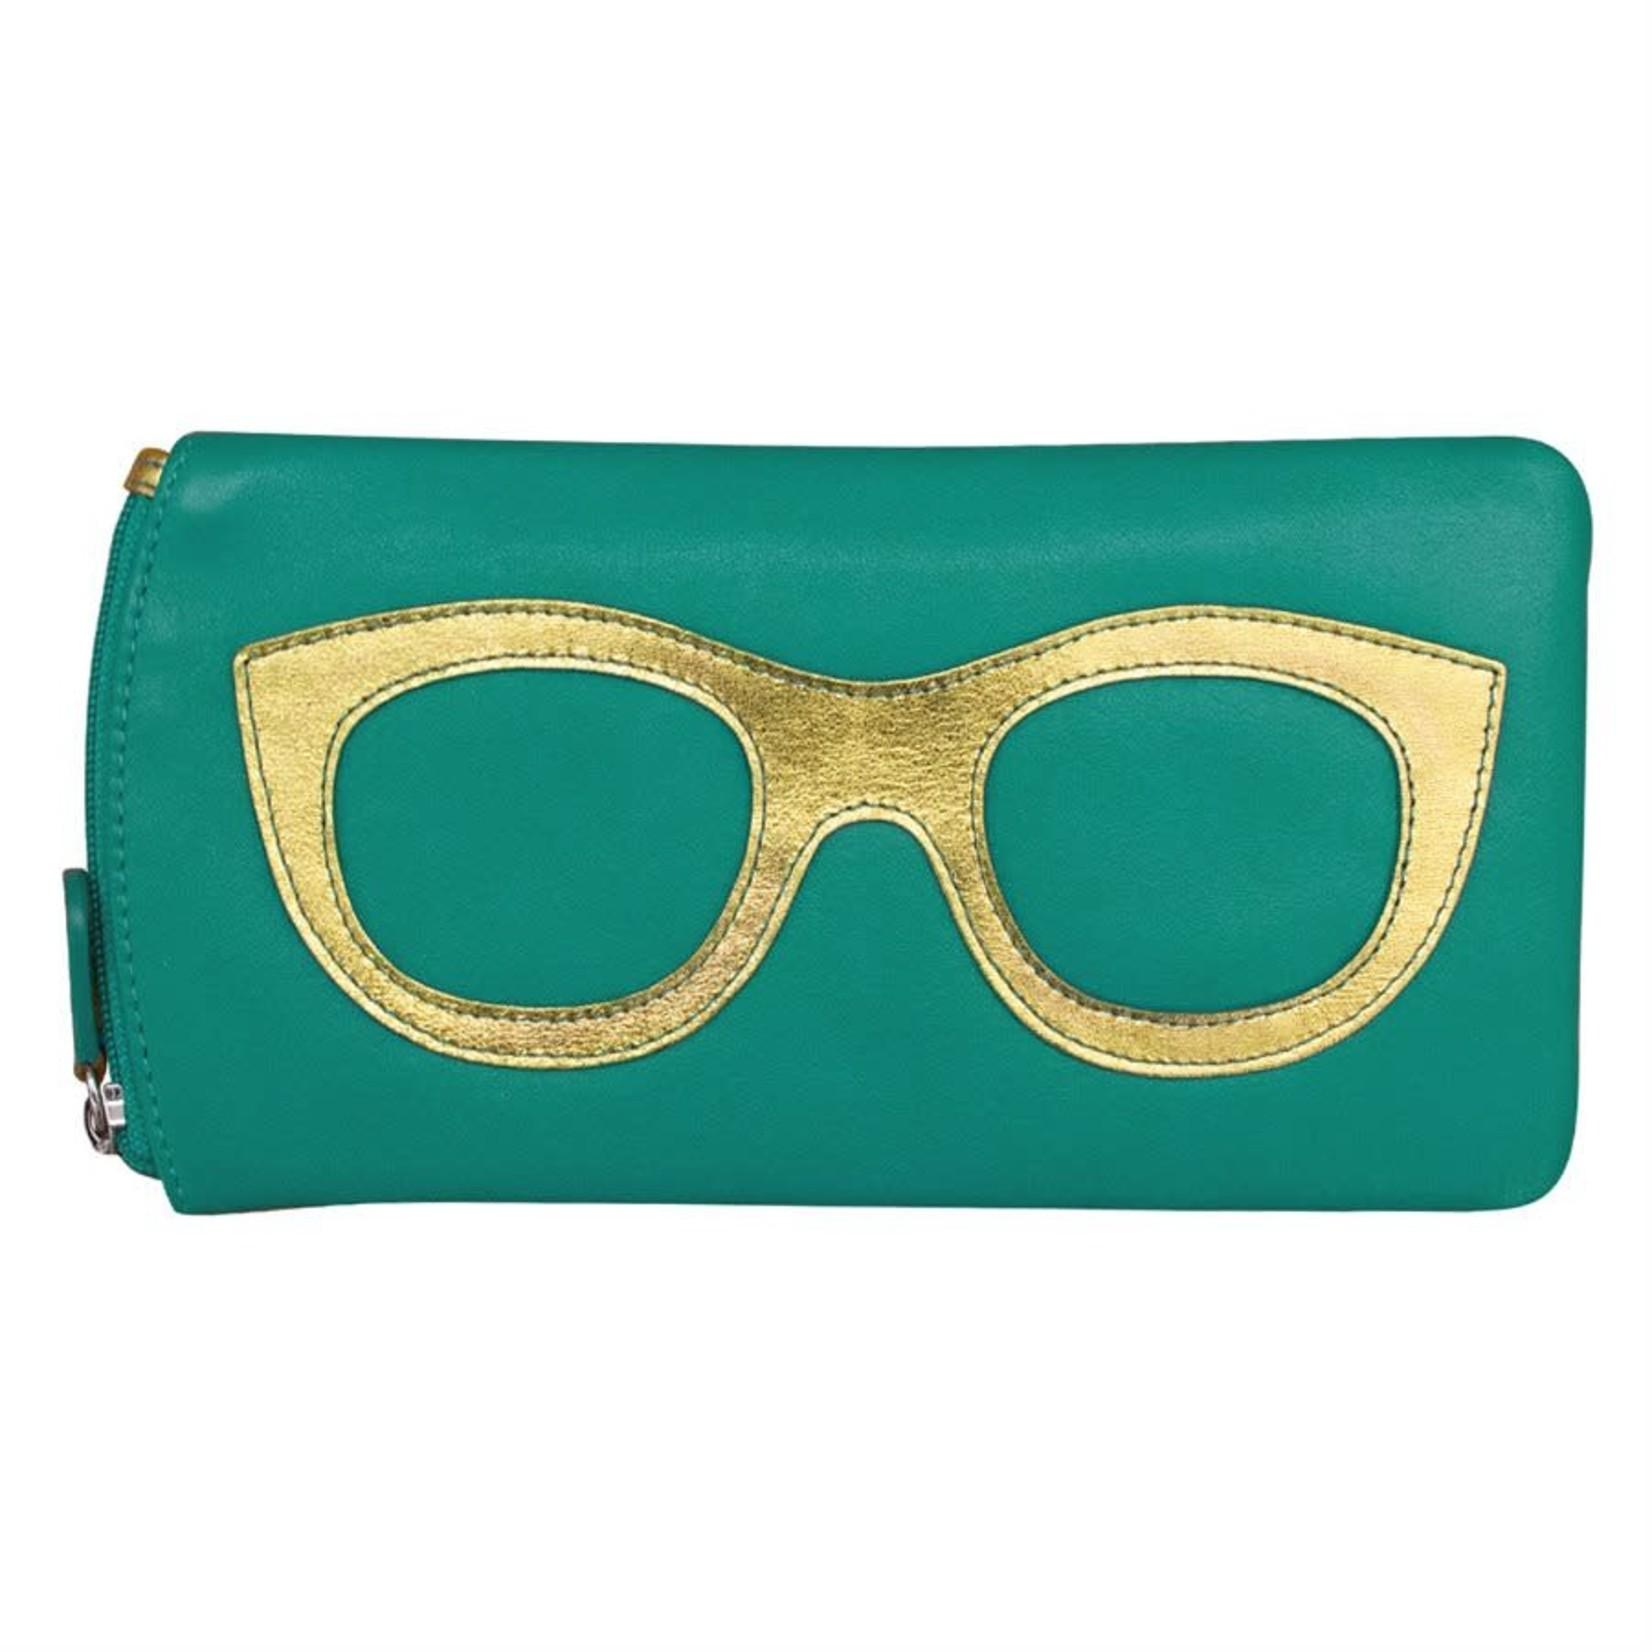 Leather Handbags and Accessories 6462 Aqua/Metallic Gold - Leather Eyeglass Case